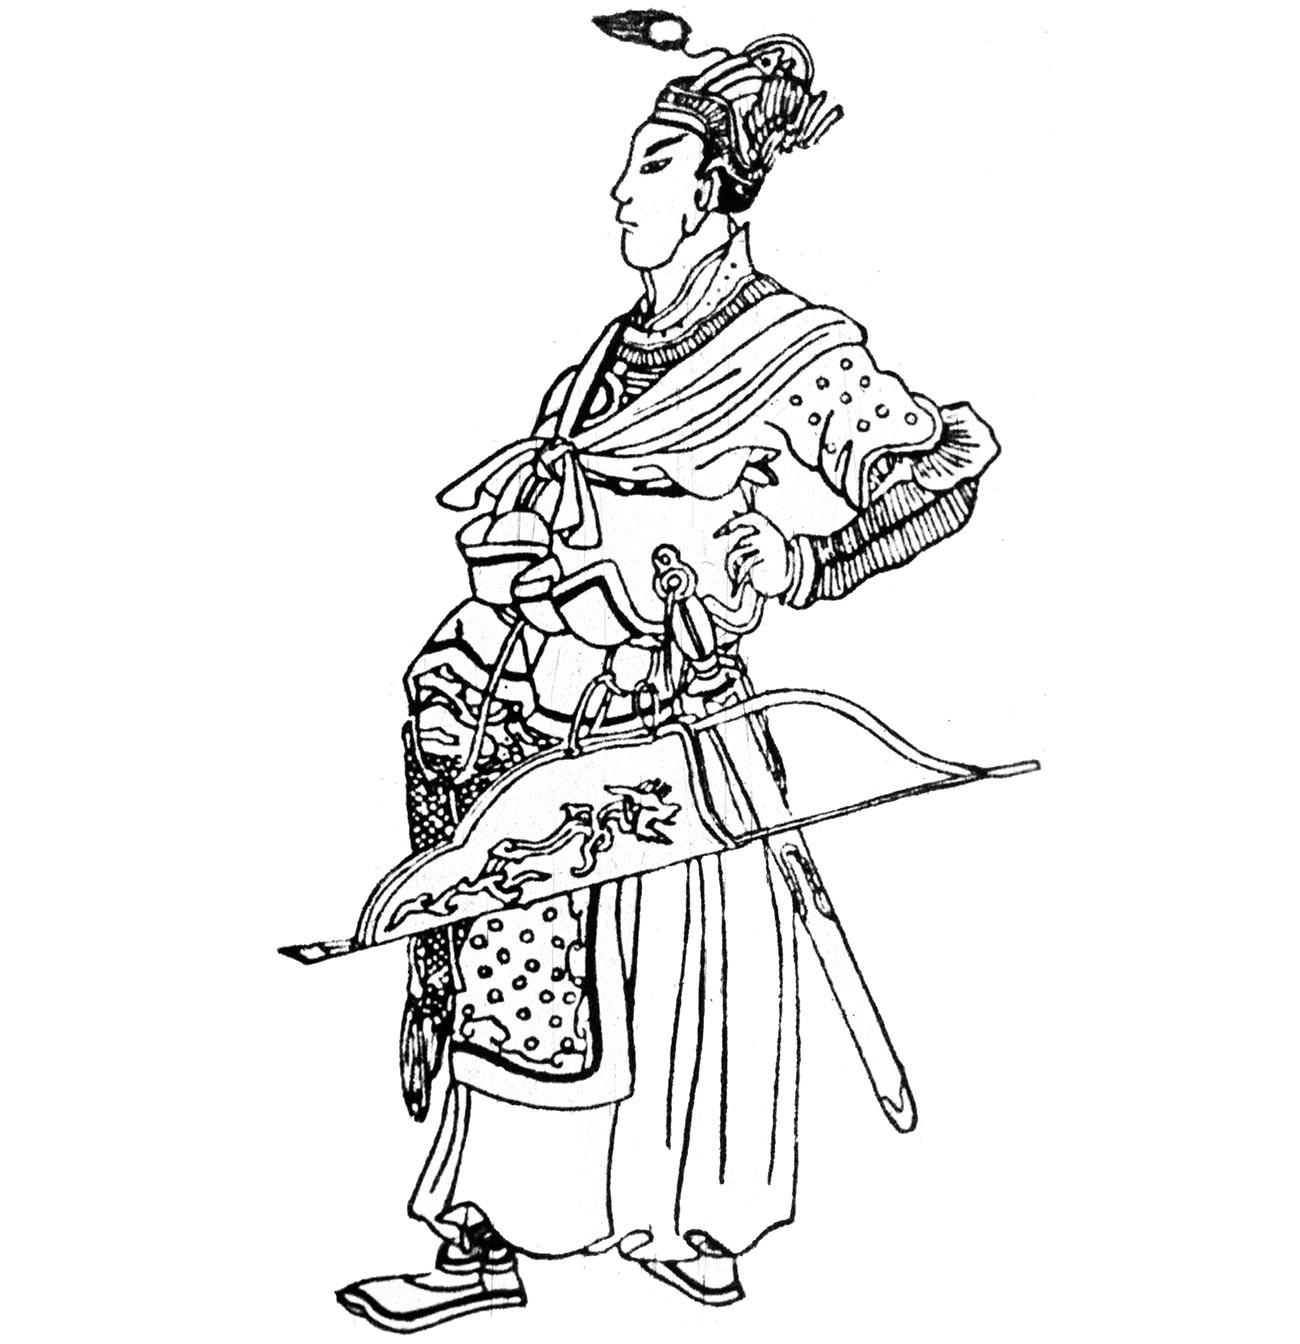 Batu Khan, seperti yang terlihat pada lukisan Cina Abad Pertengahan.